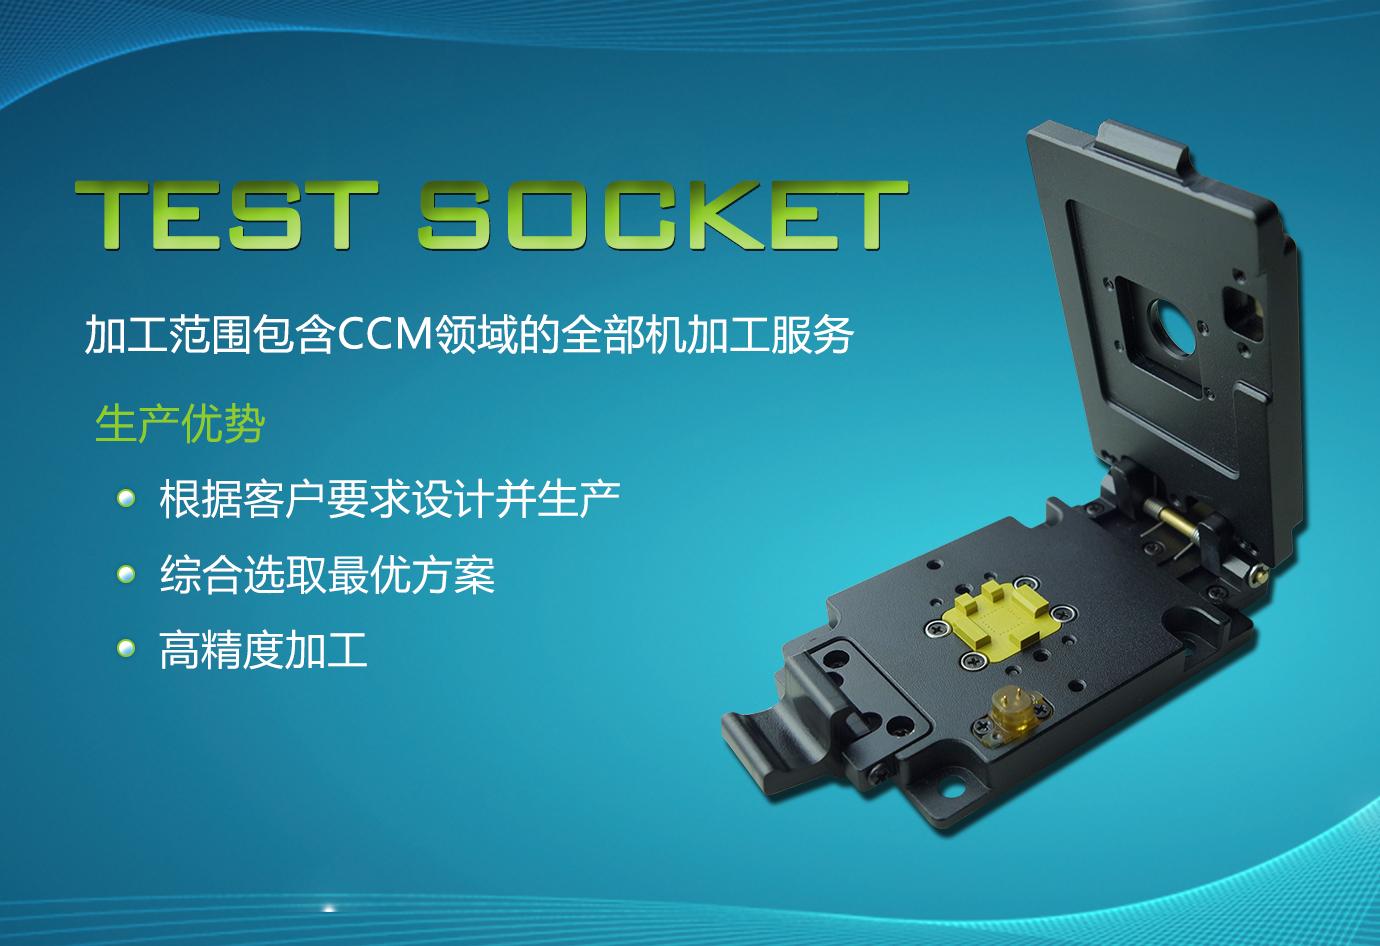 Test Socket